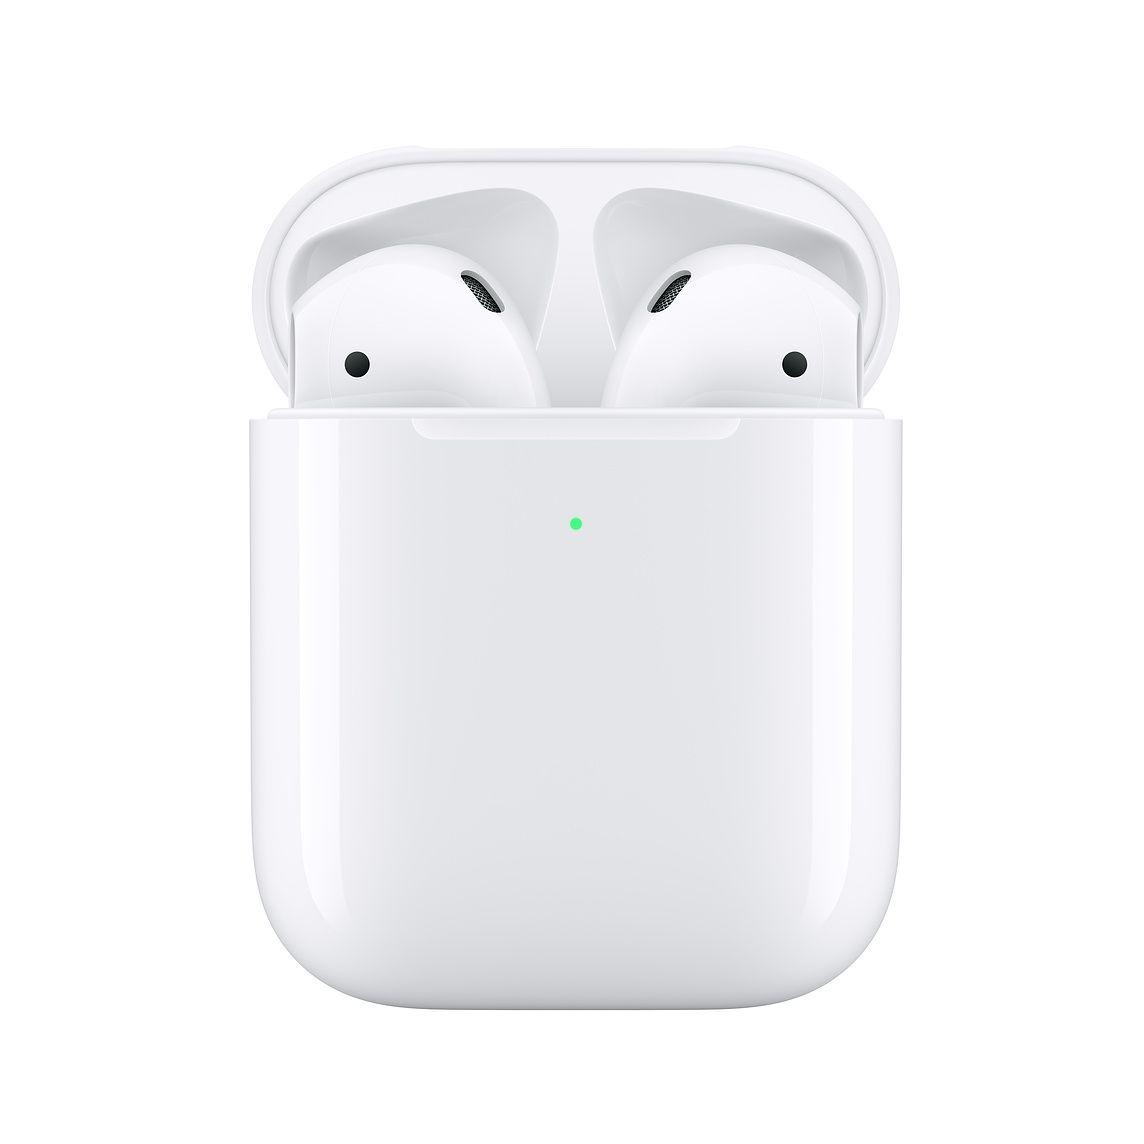 Fone De Ouvido Apple Airpods Sem Fio Modelo 2 Plus  Wireless Charging Case